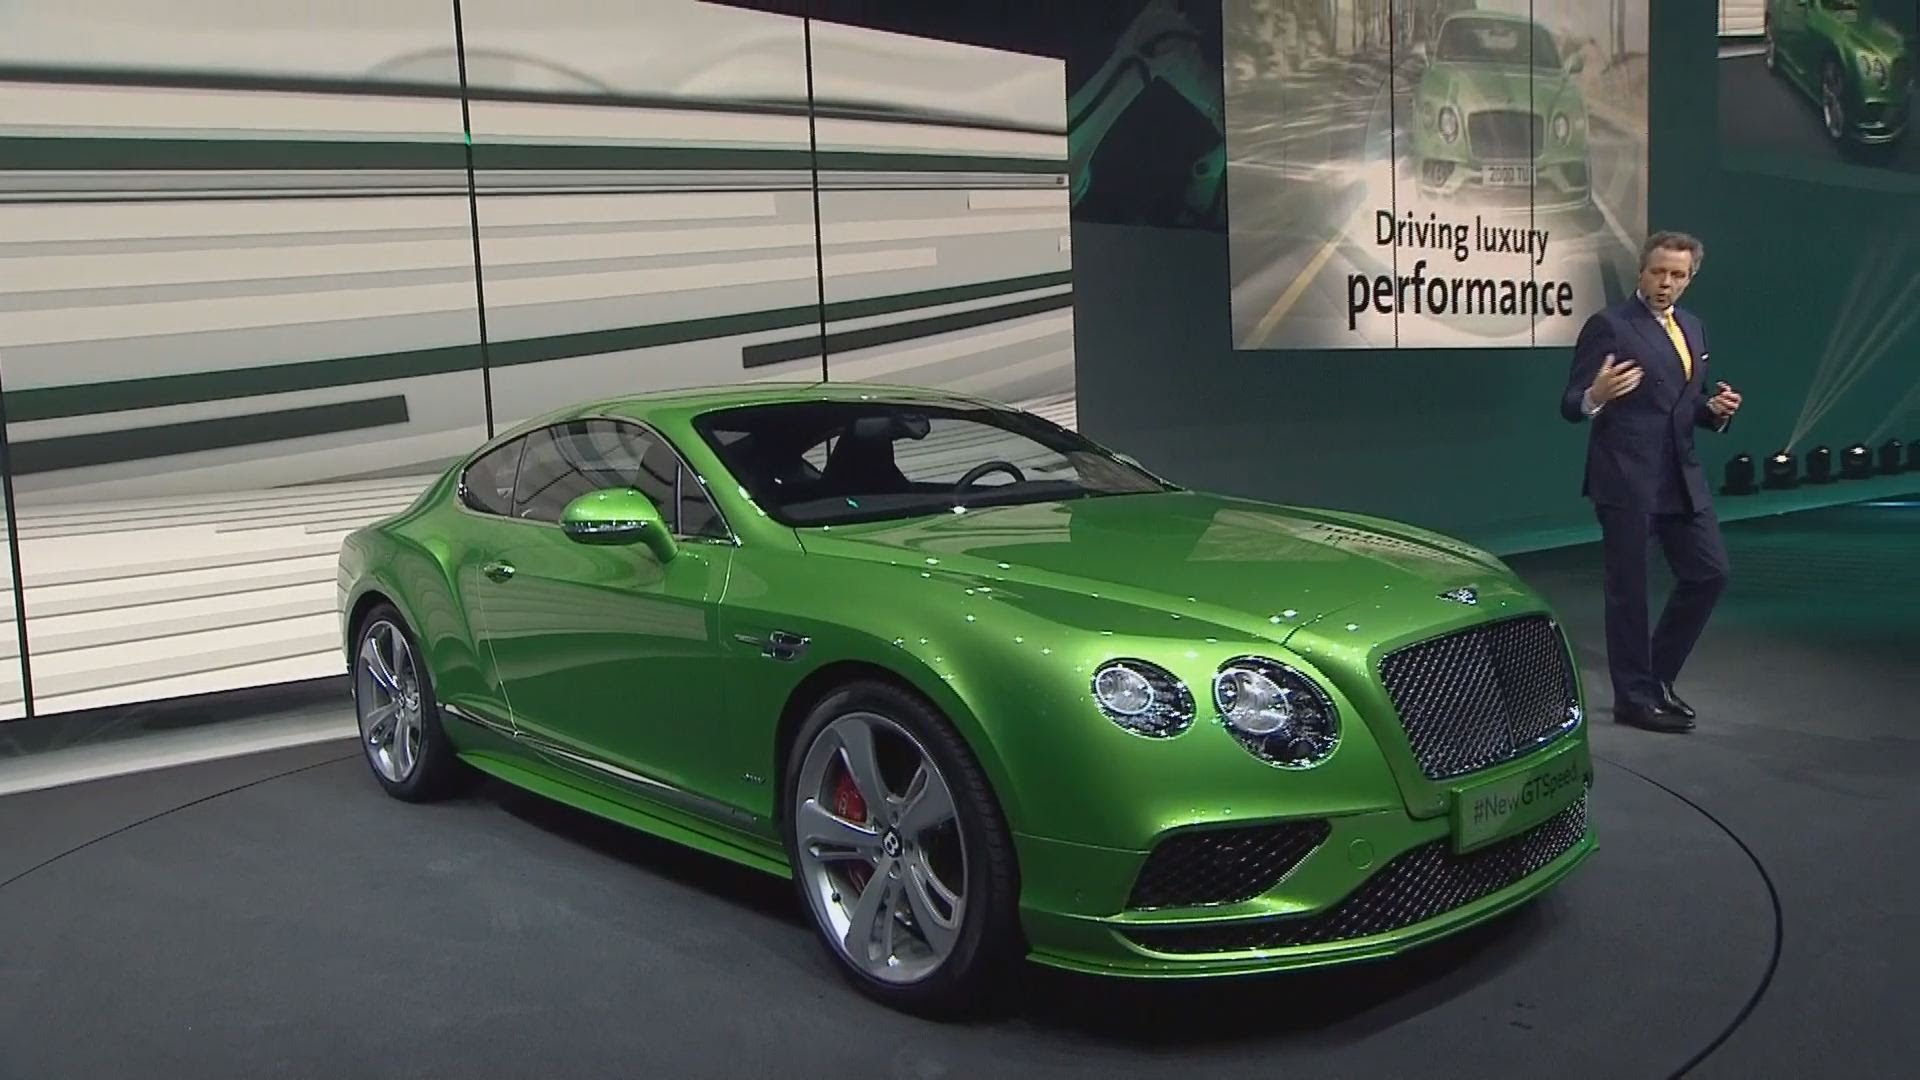 Overview: 2016 Bentley Continental GT Speed